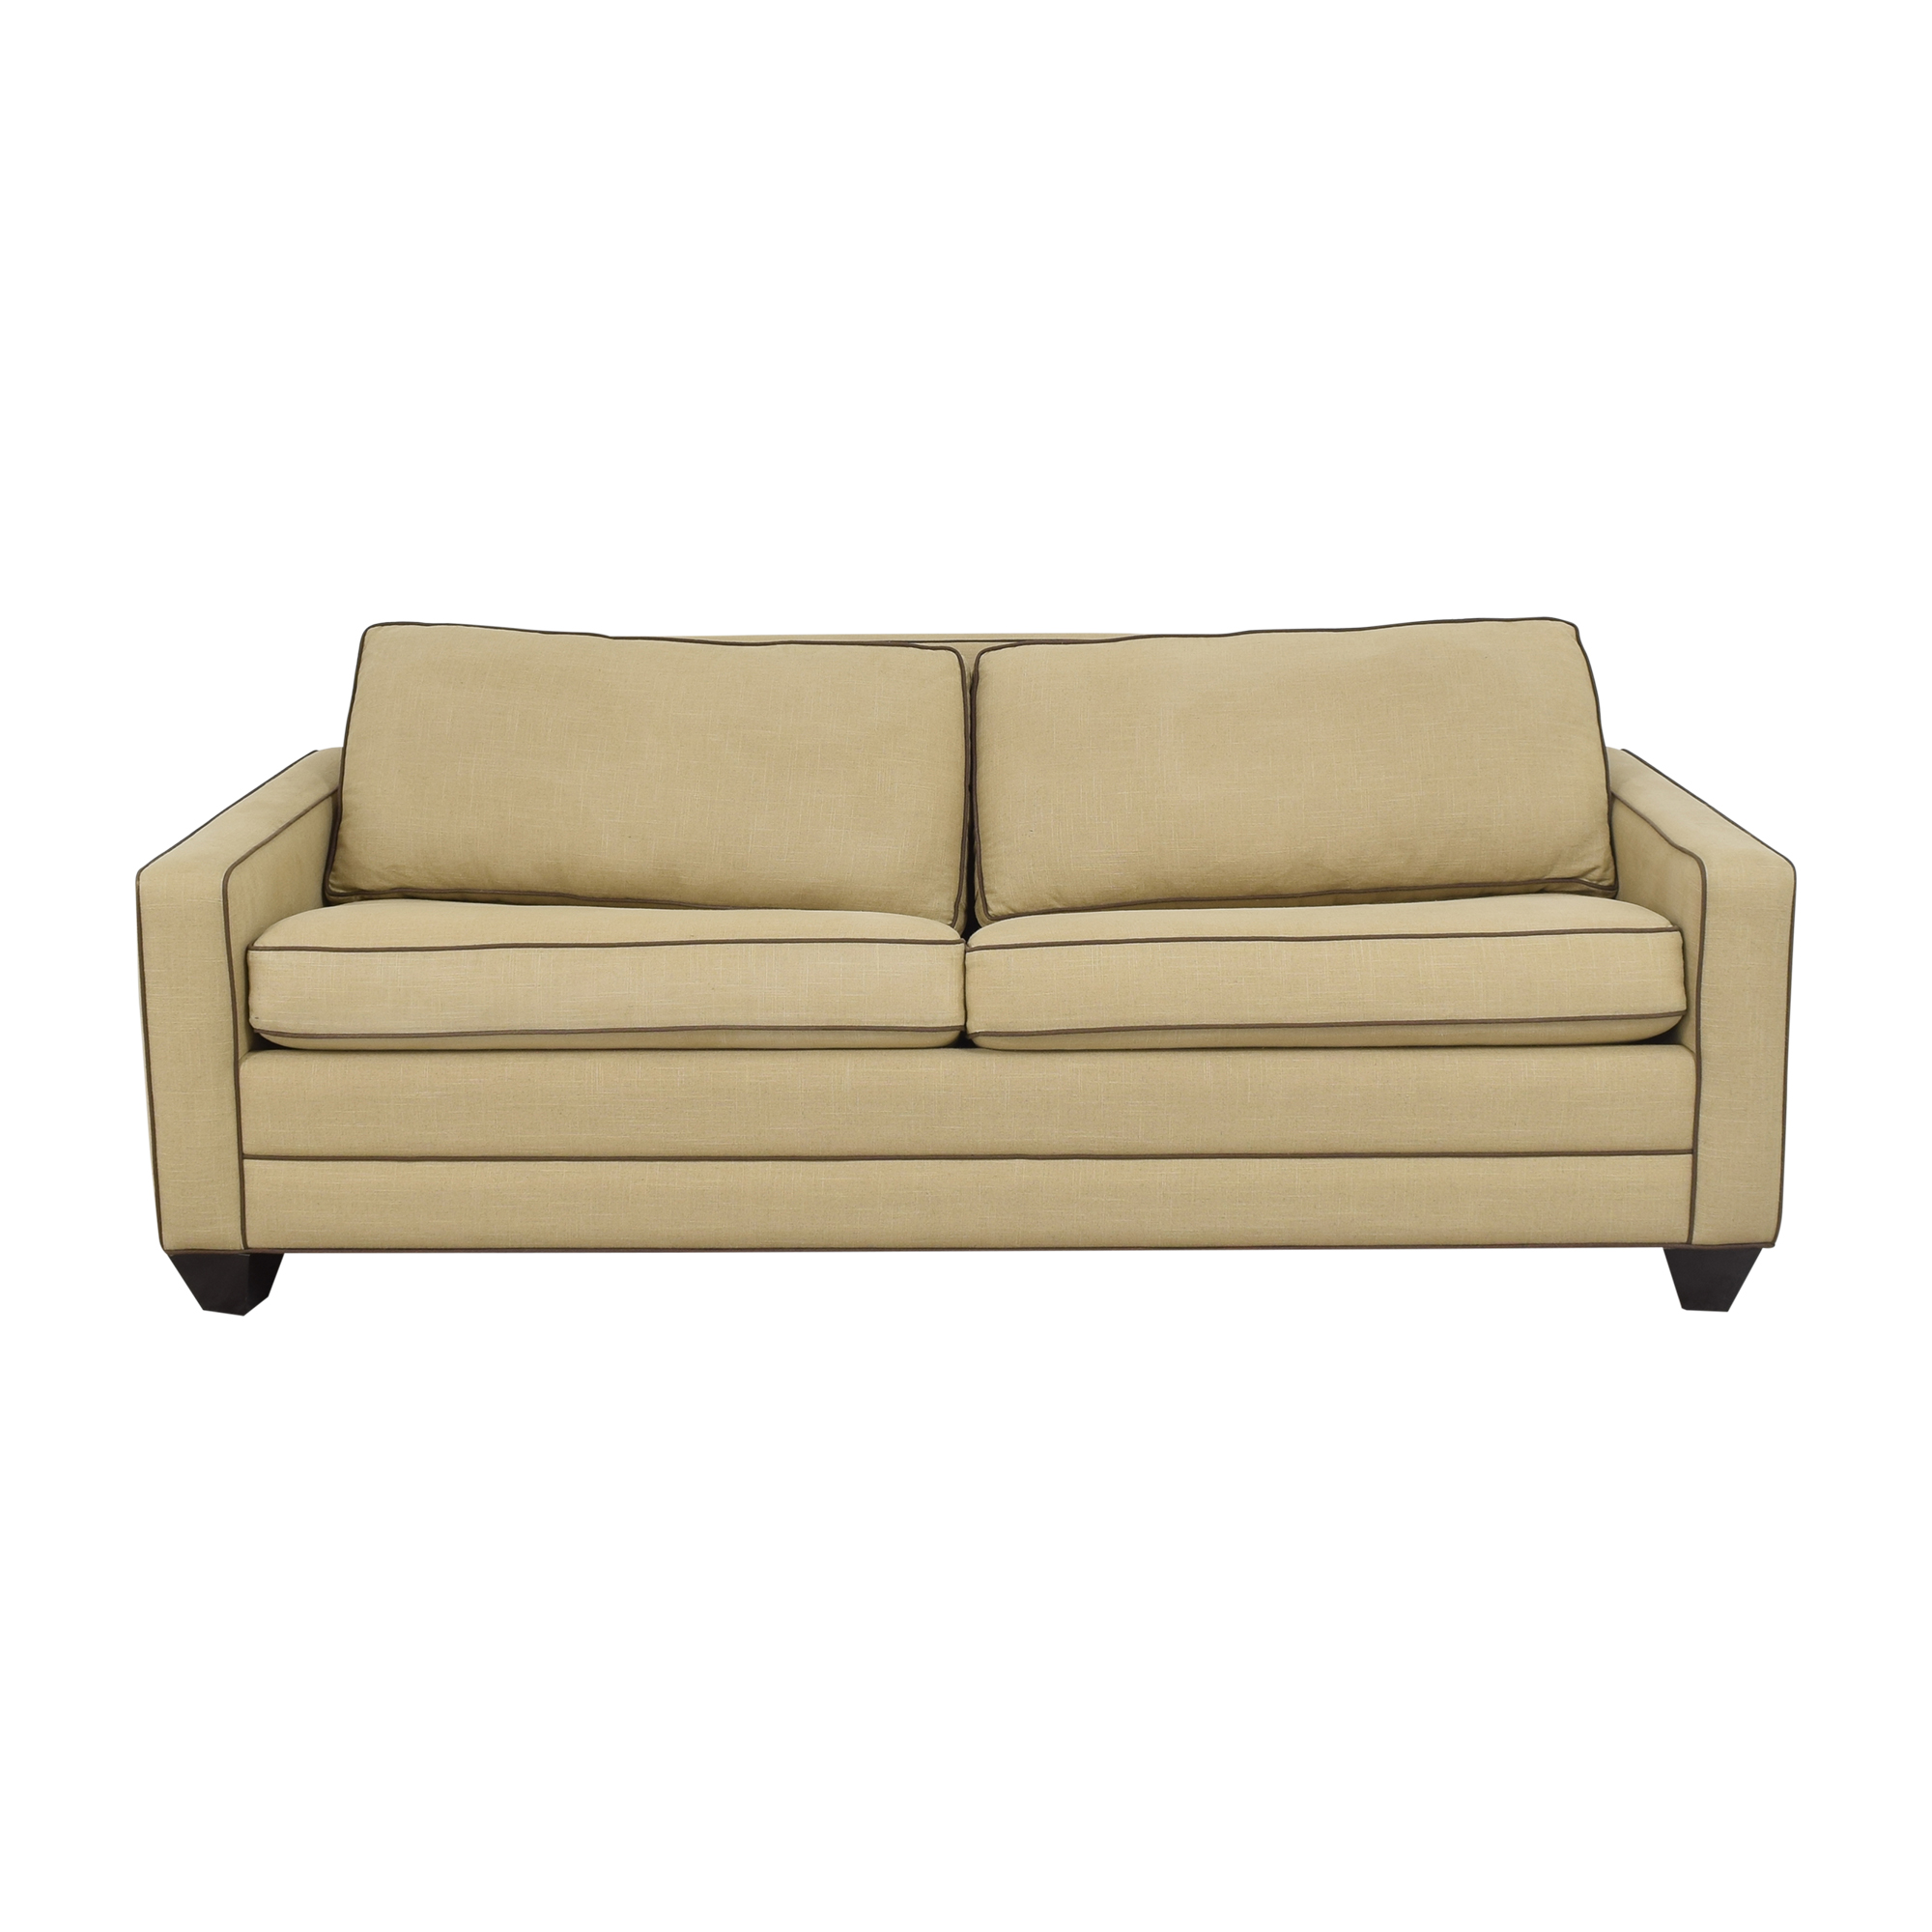 Carlyle Custom Sleeper Sofa / Sofa Beds